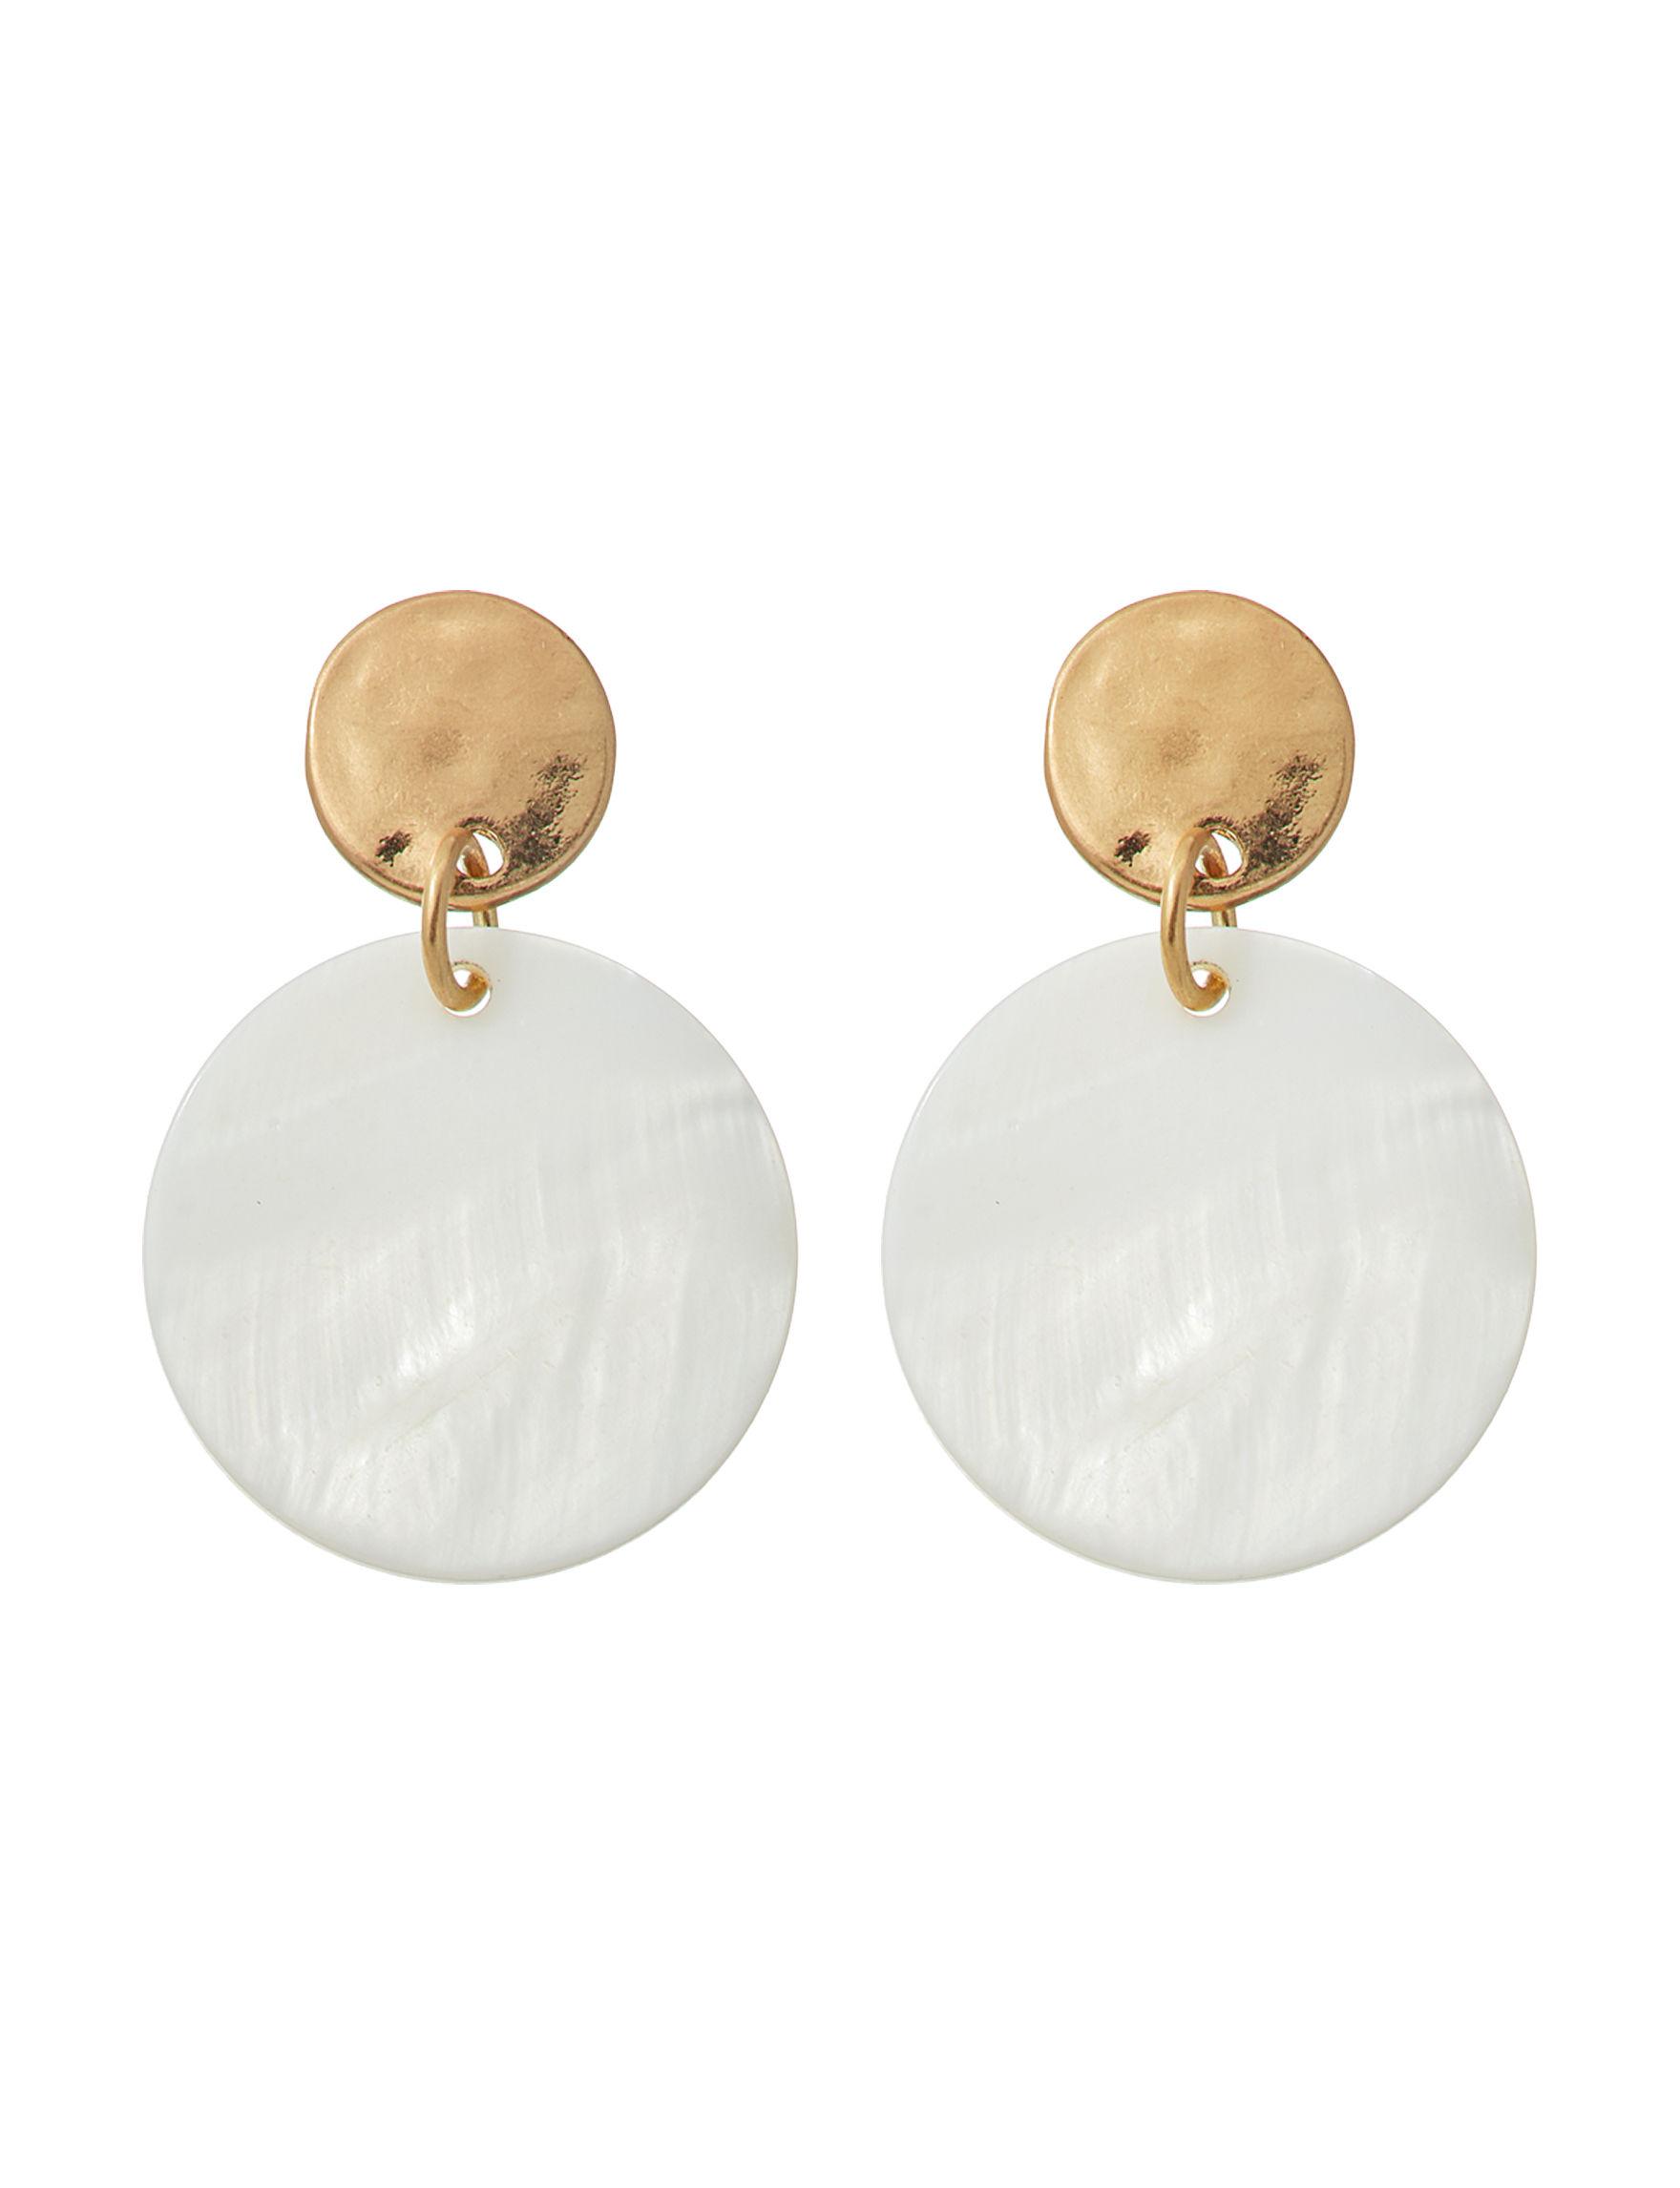 Hannah Gold / White Drops Earrings Fashion Jewelry